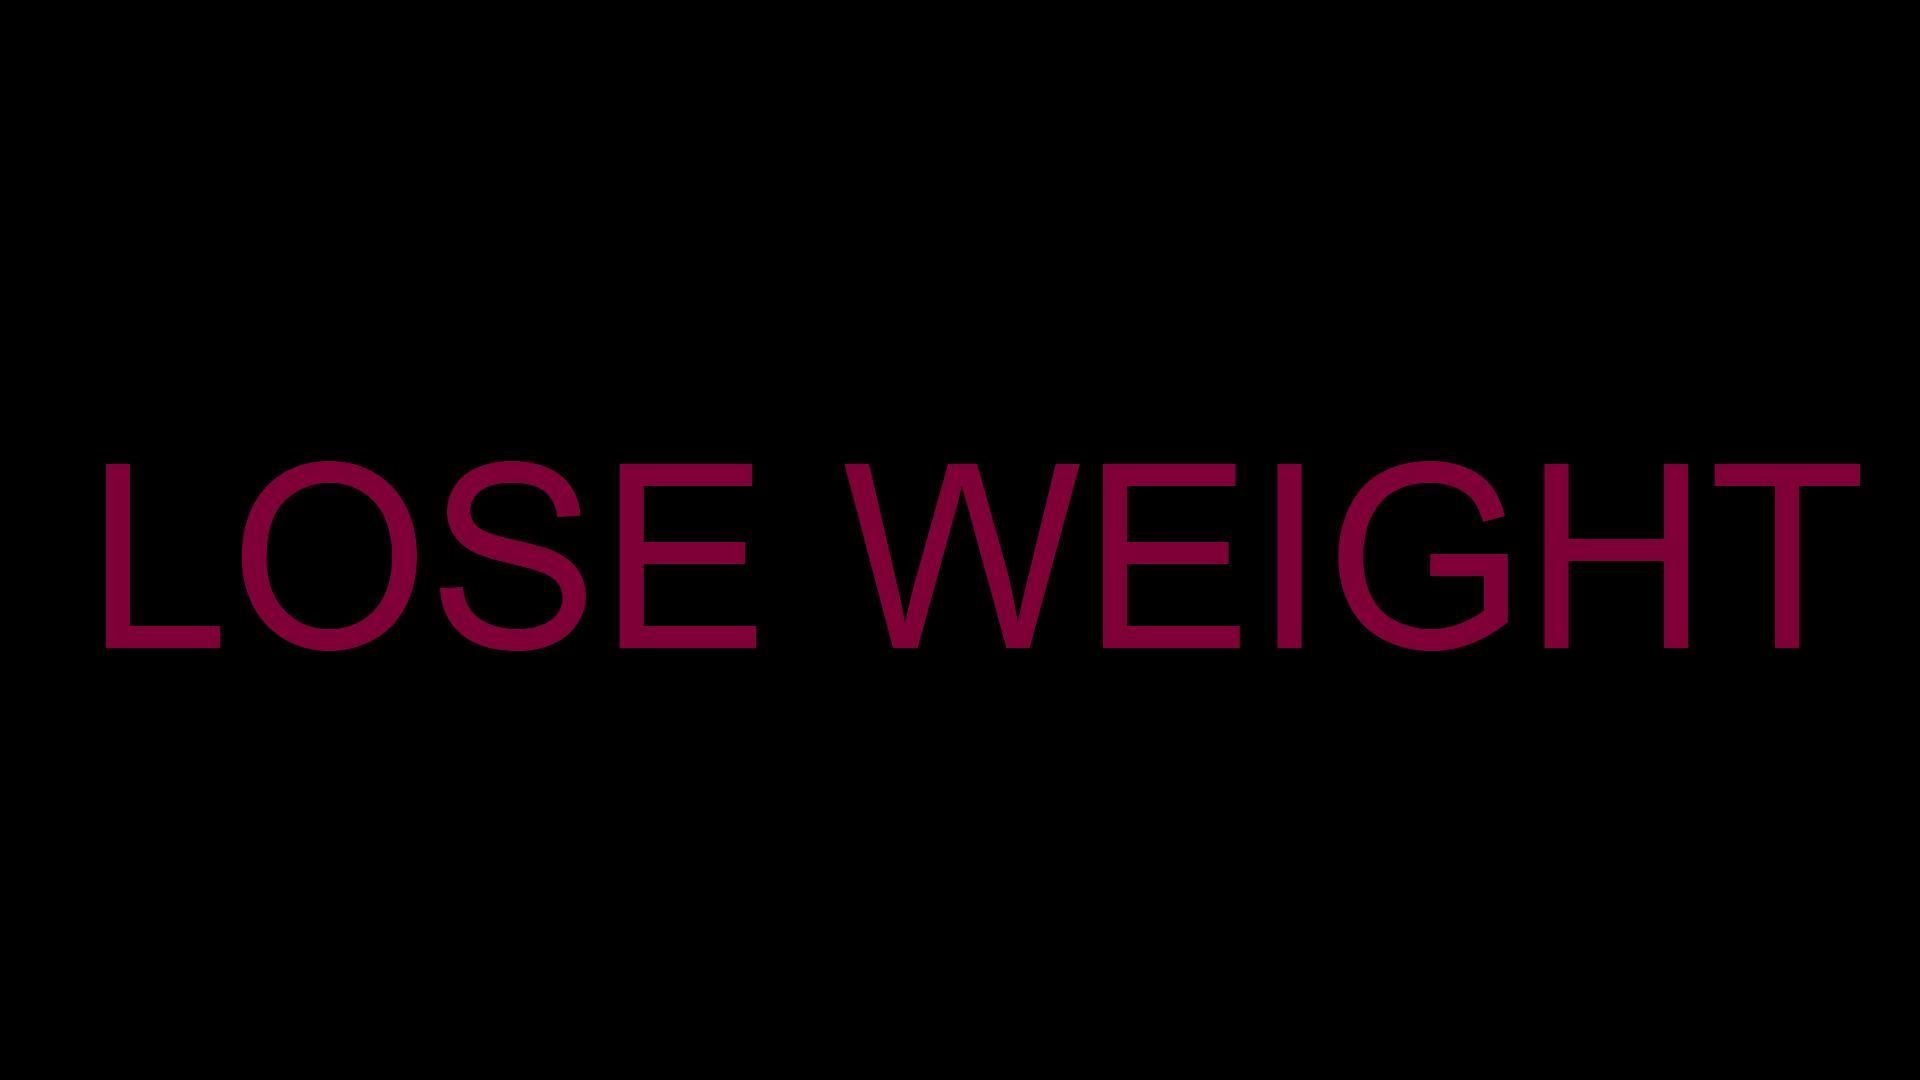 42 Weight Loss Desktop Wallpaper On Wallpapersafari